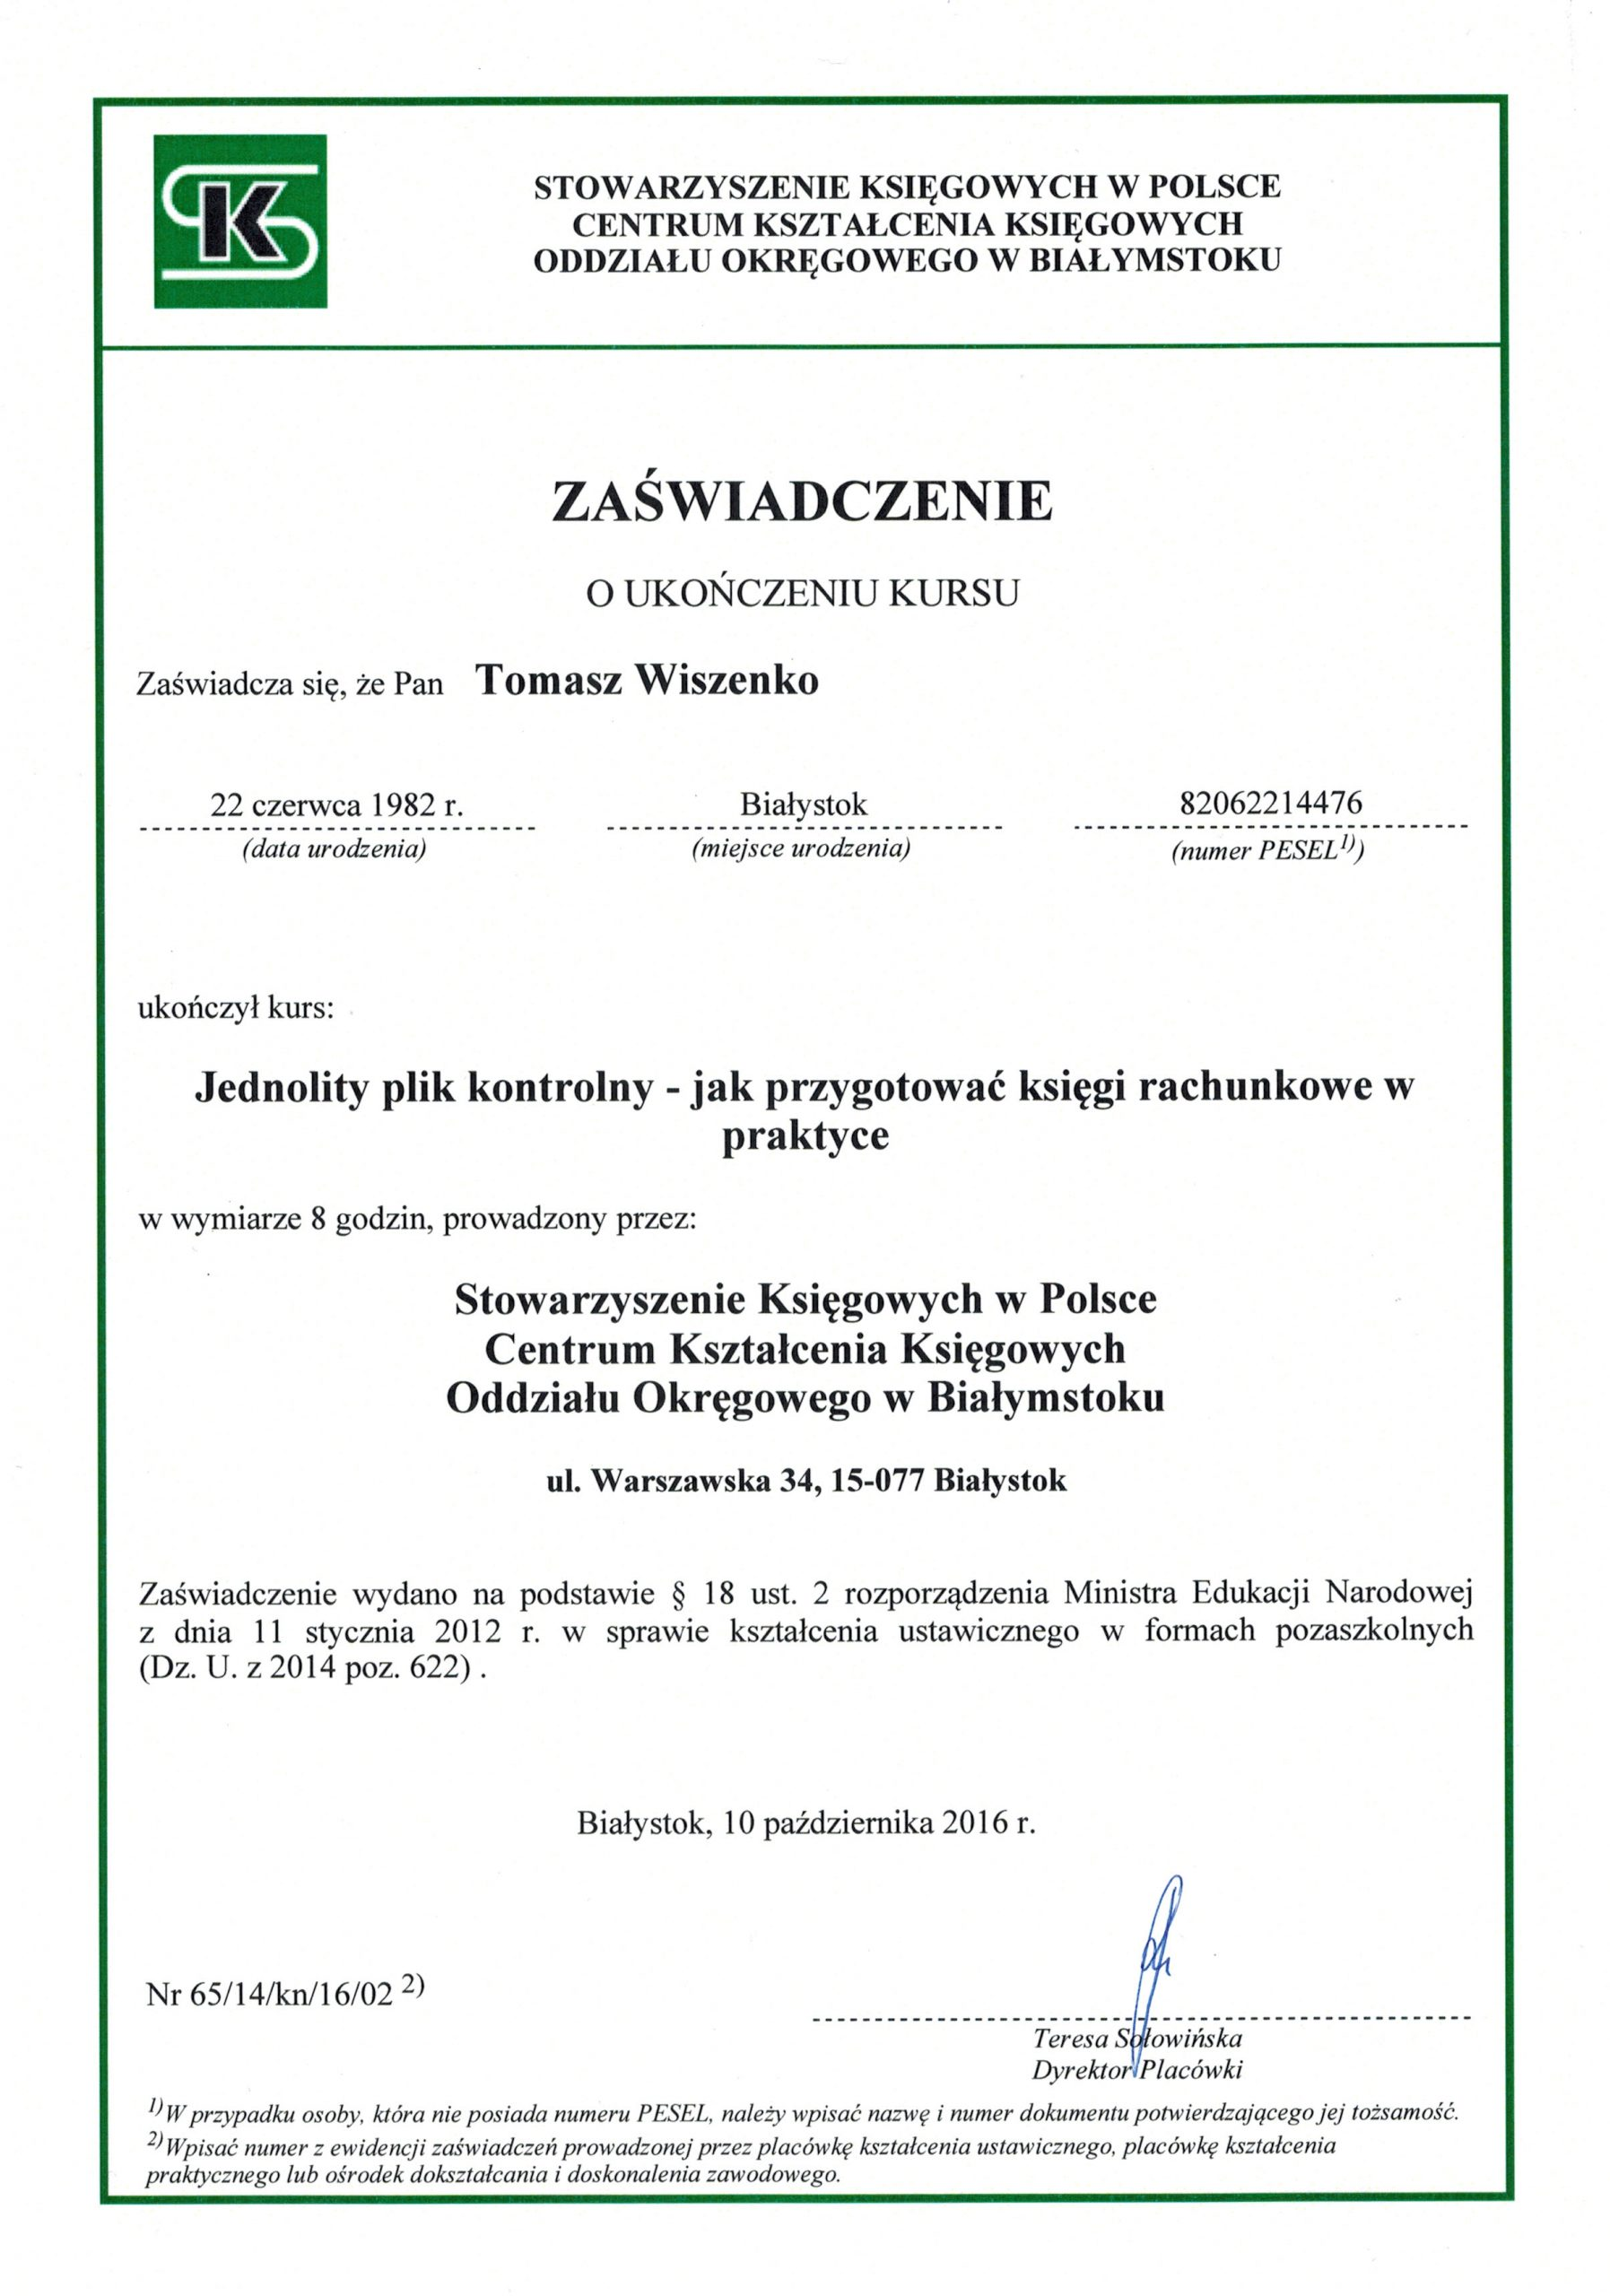 Tomasz Wiszenko - JPK Certyfikat